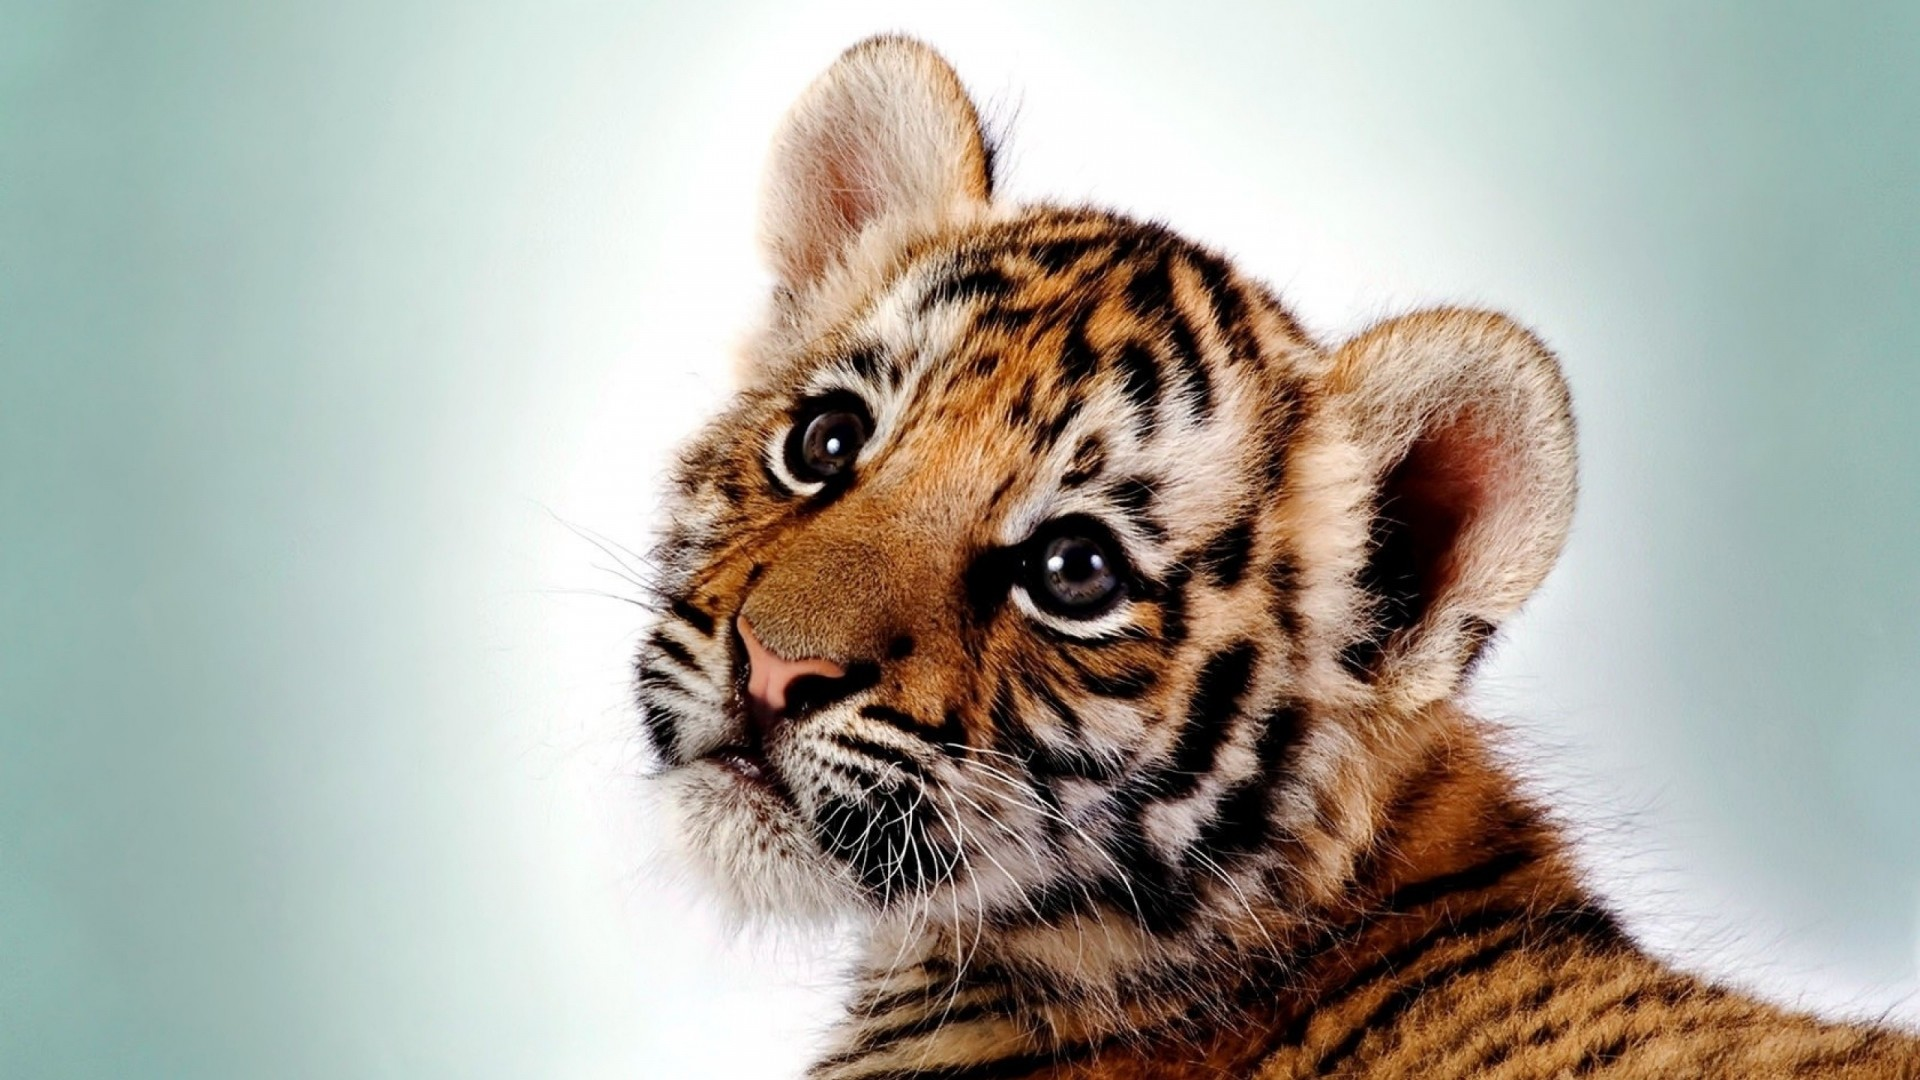 Preview wallpaper tiger, kitten, big cat, cub, predator 1920×1080